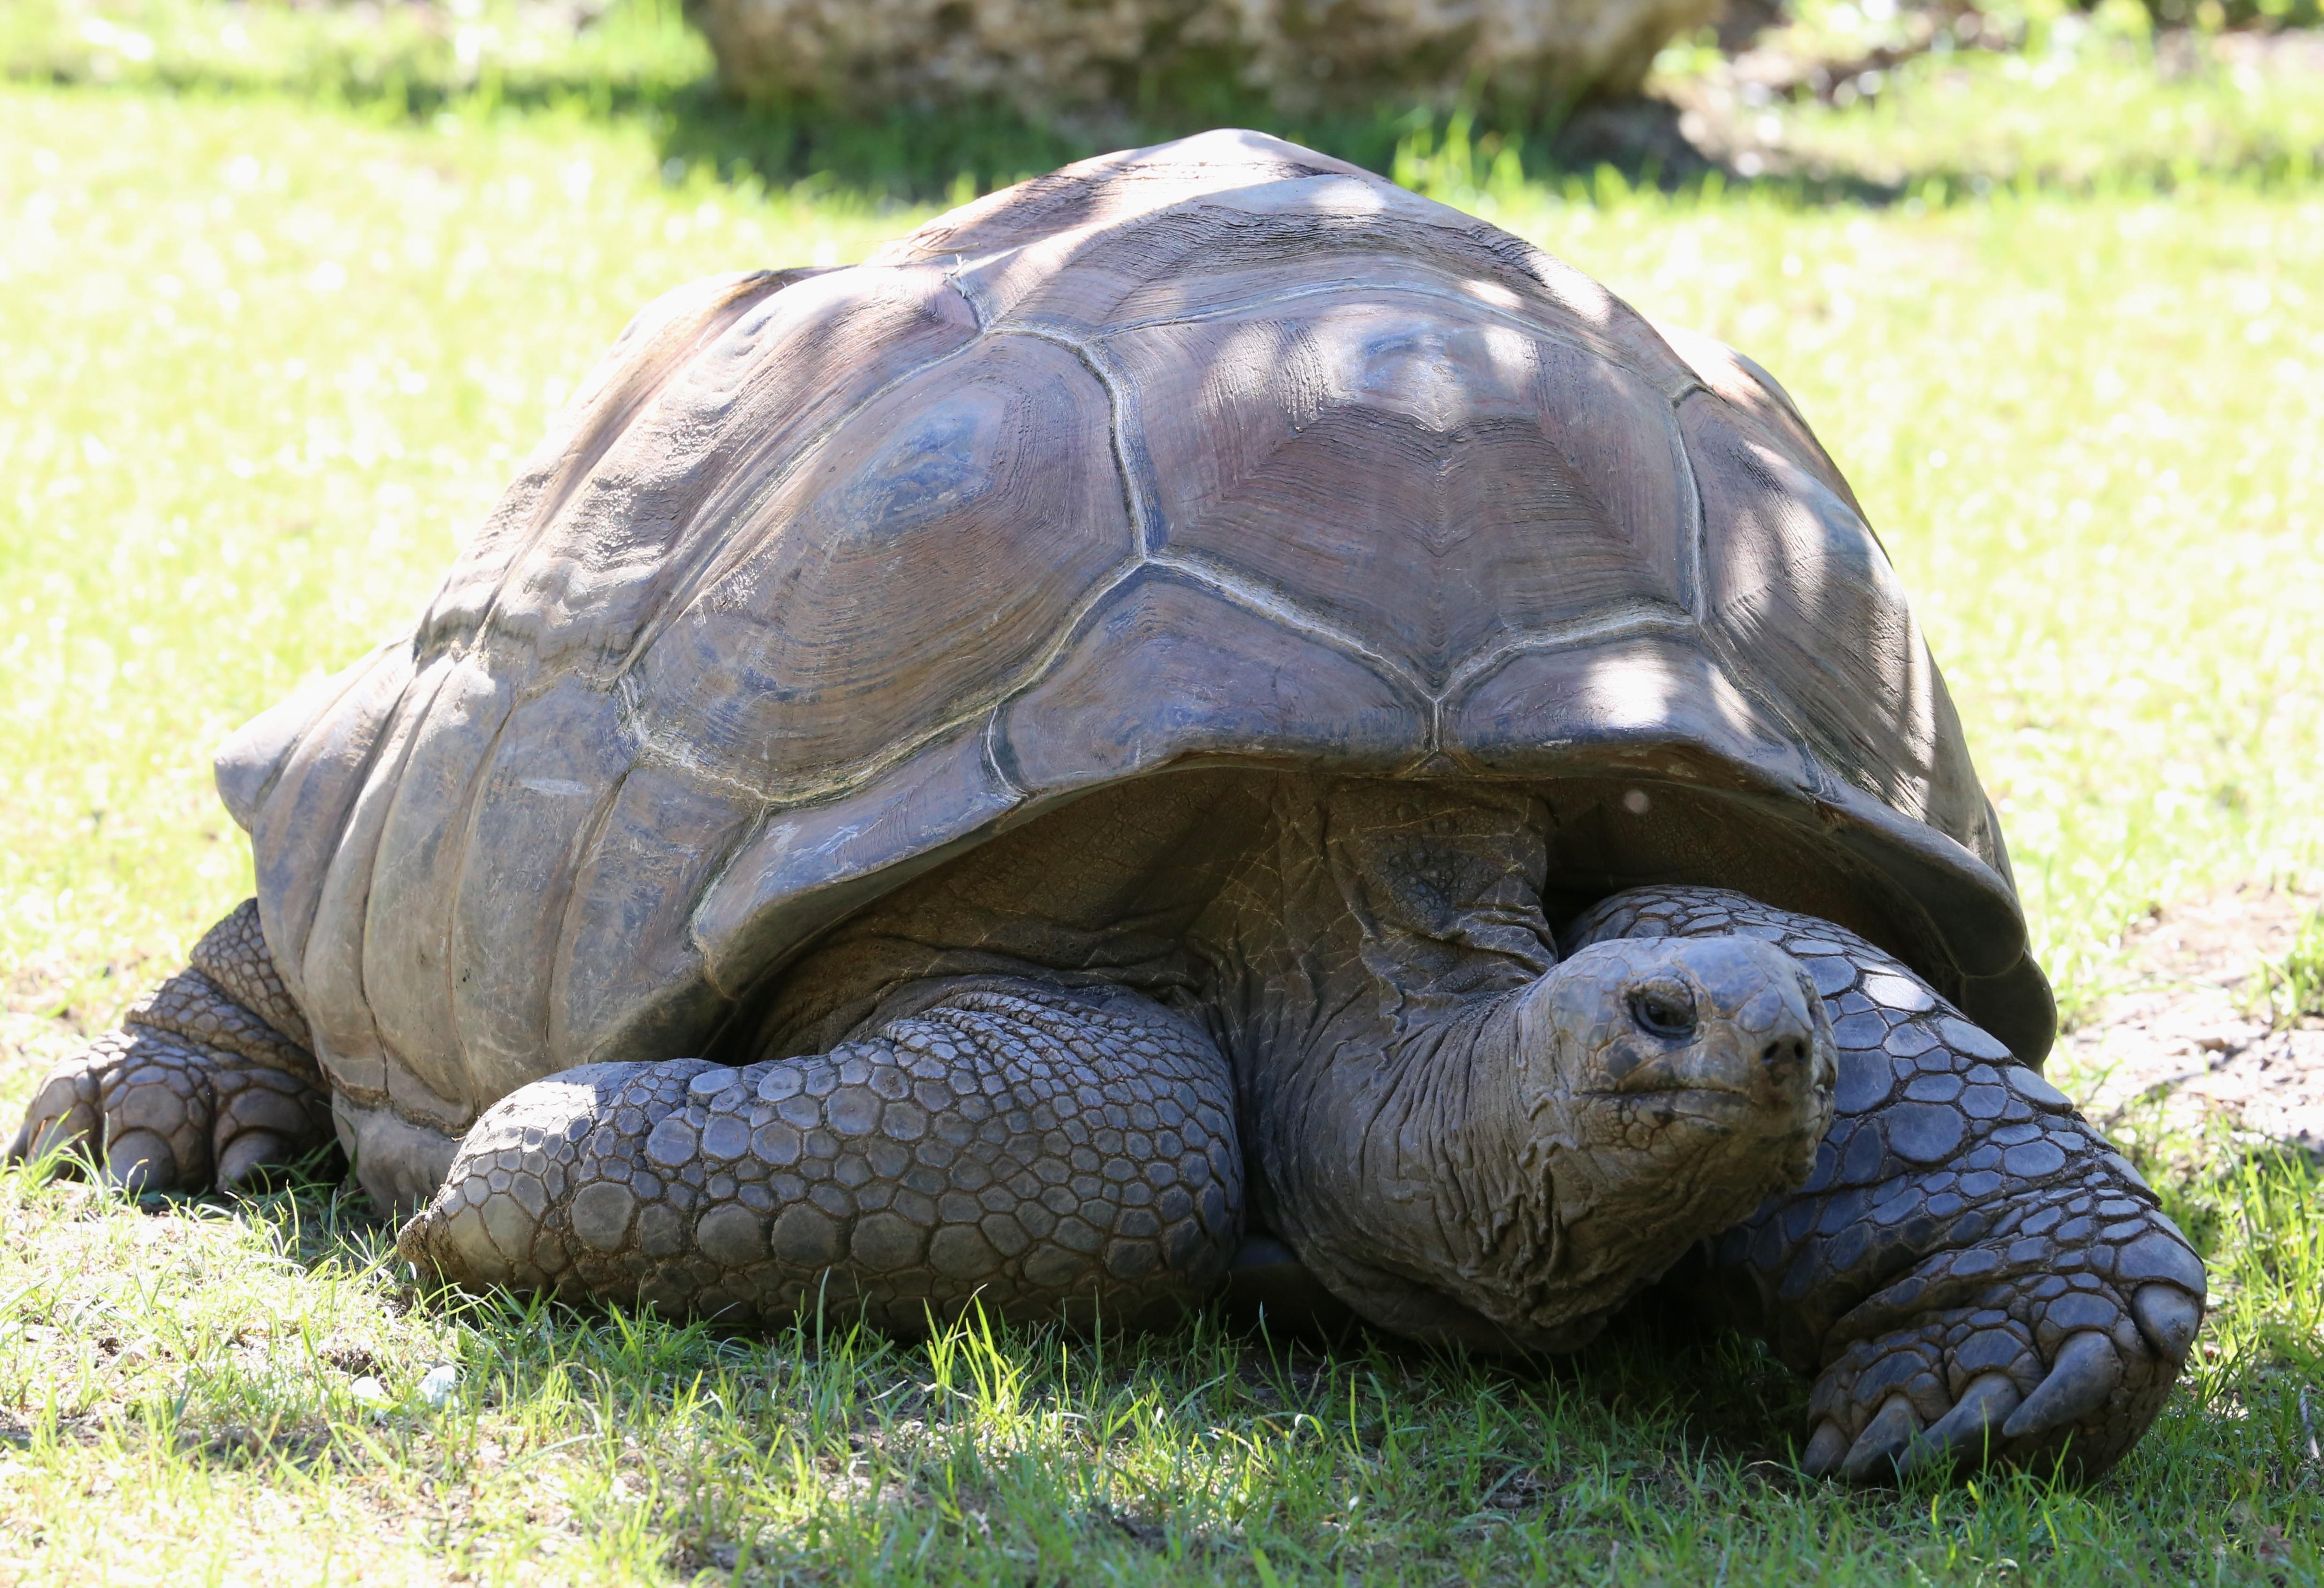 Aldabra giant tortoise - Wikipedia